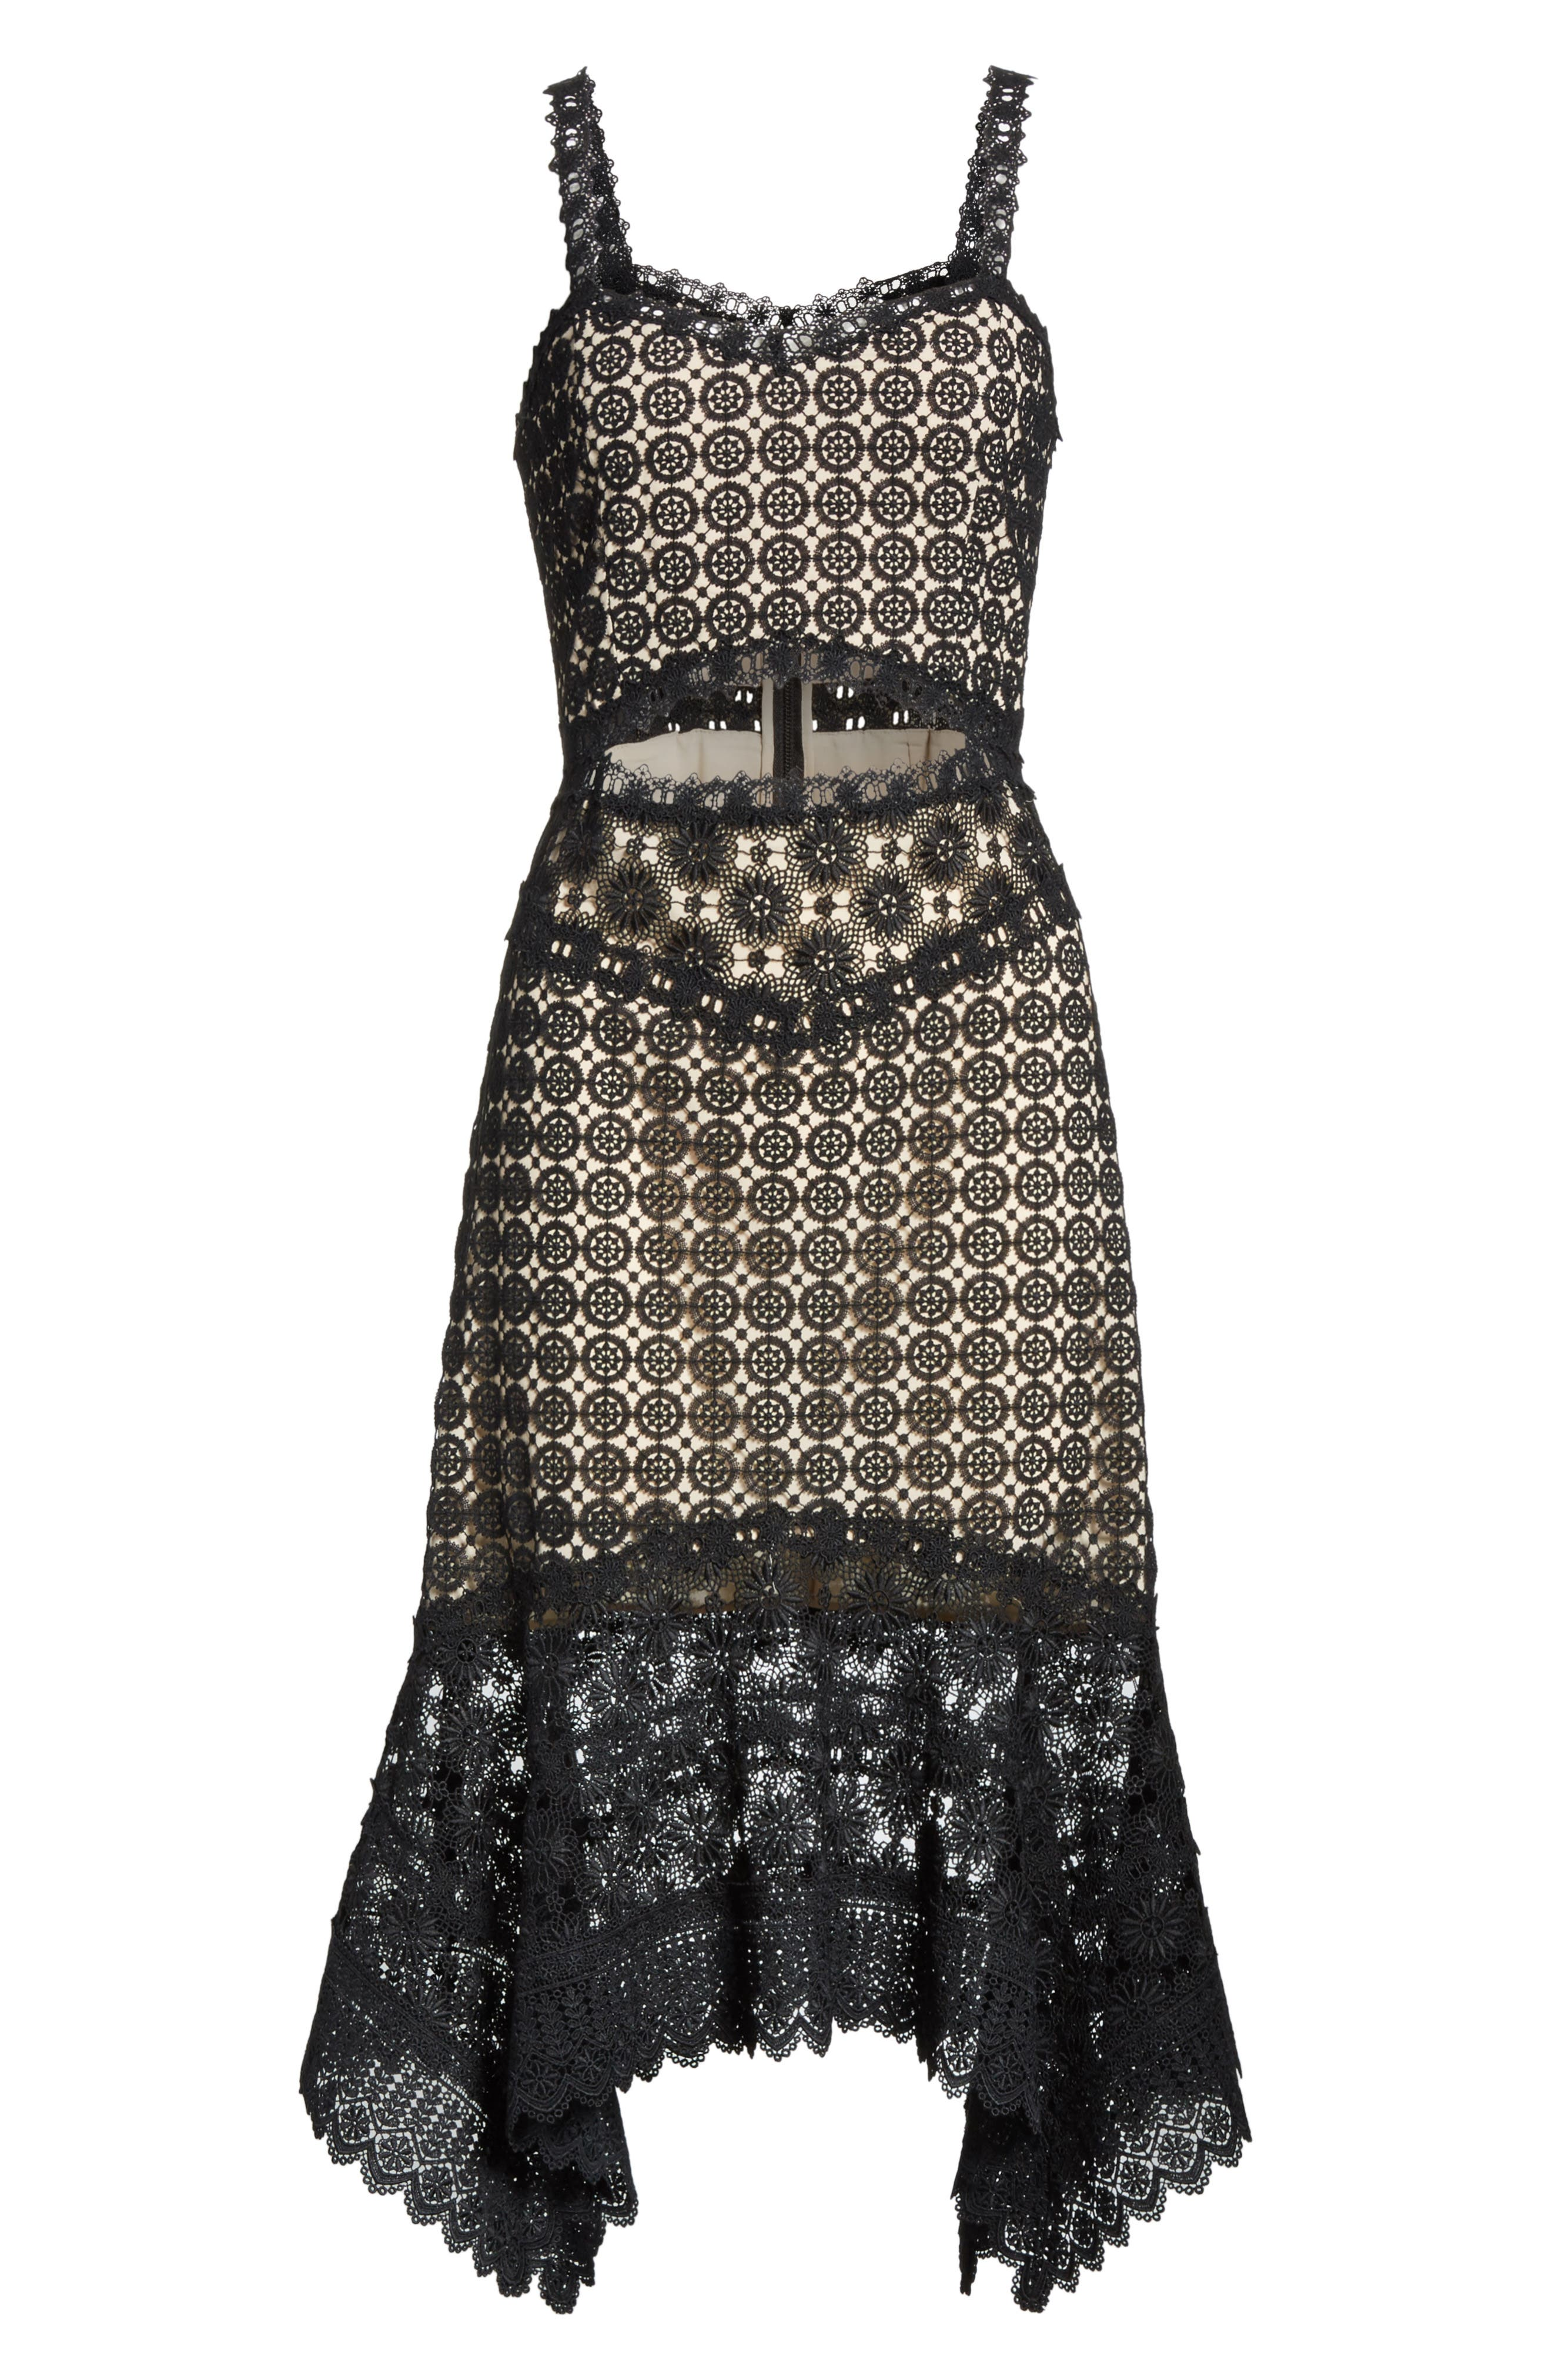 Tamika Handkerchief Lace Dress,                             Alternate thumbnail 6, color,